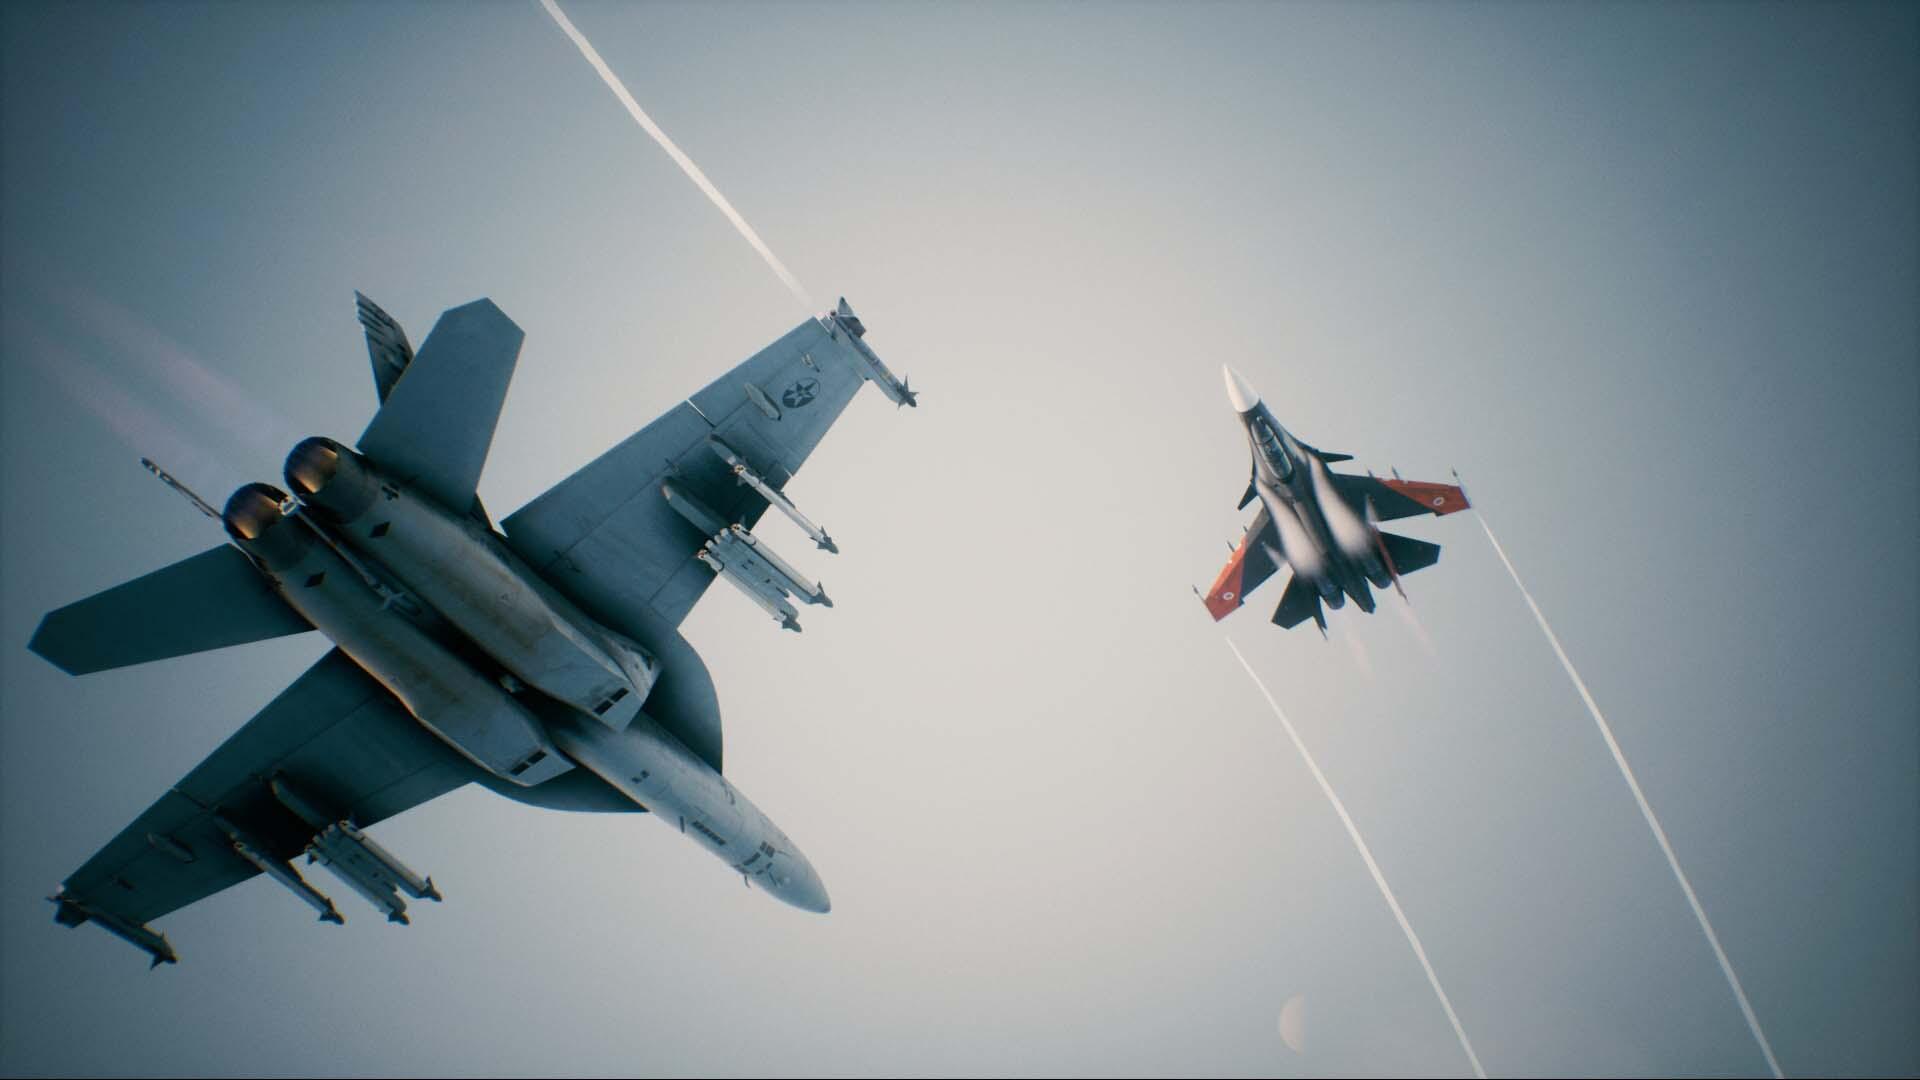 ace-combat-7-08-22-17-2.jpg